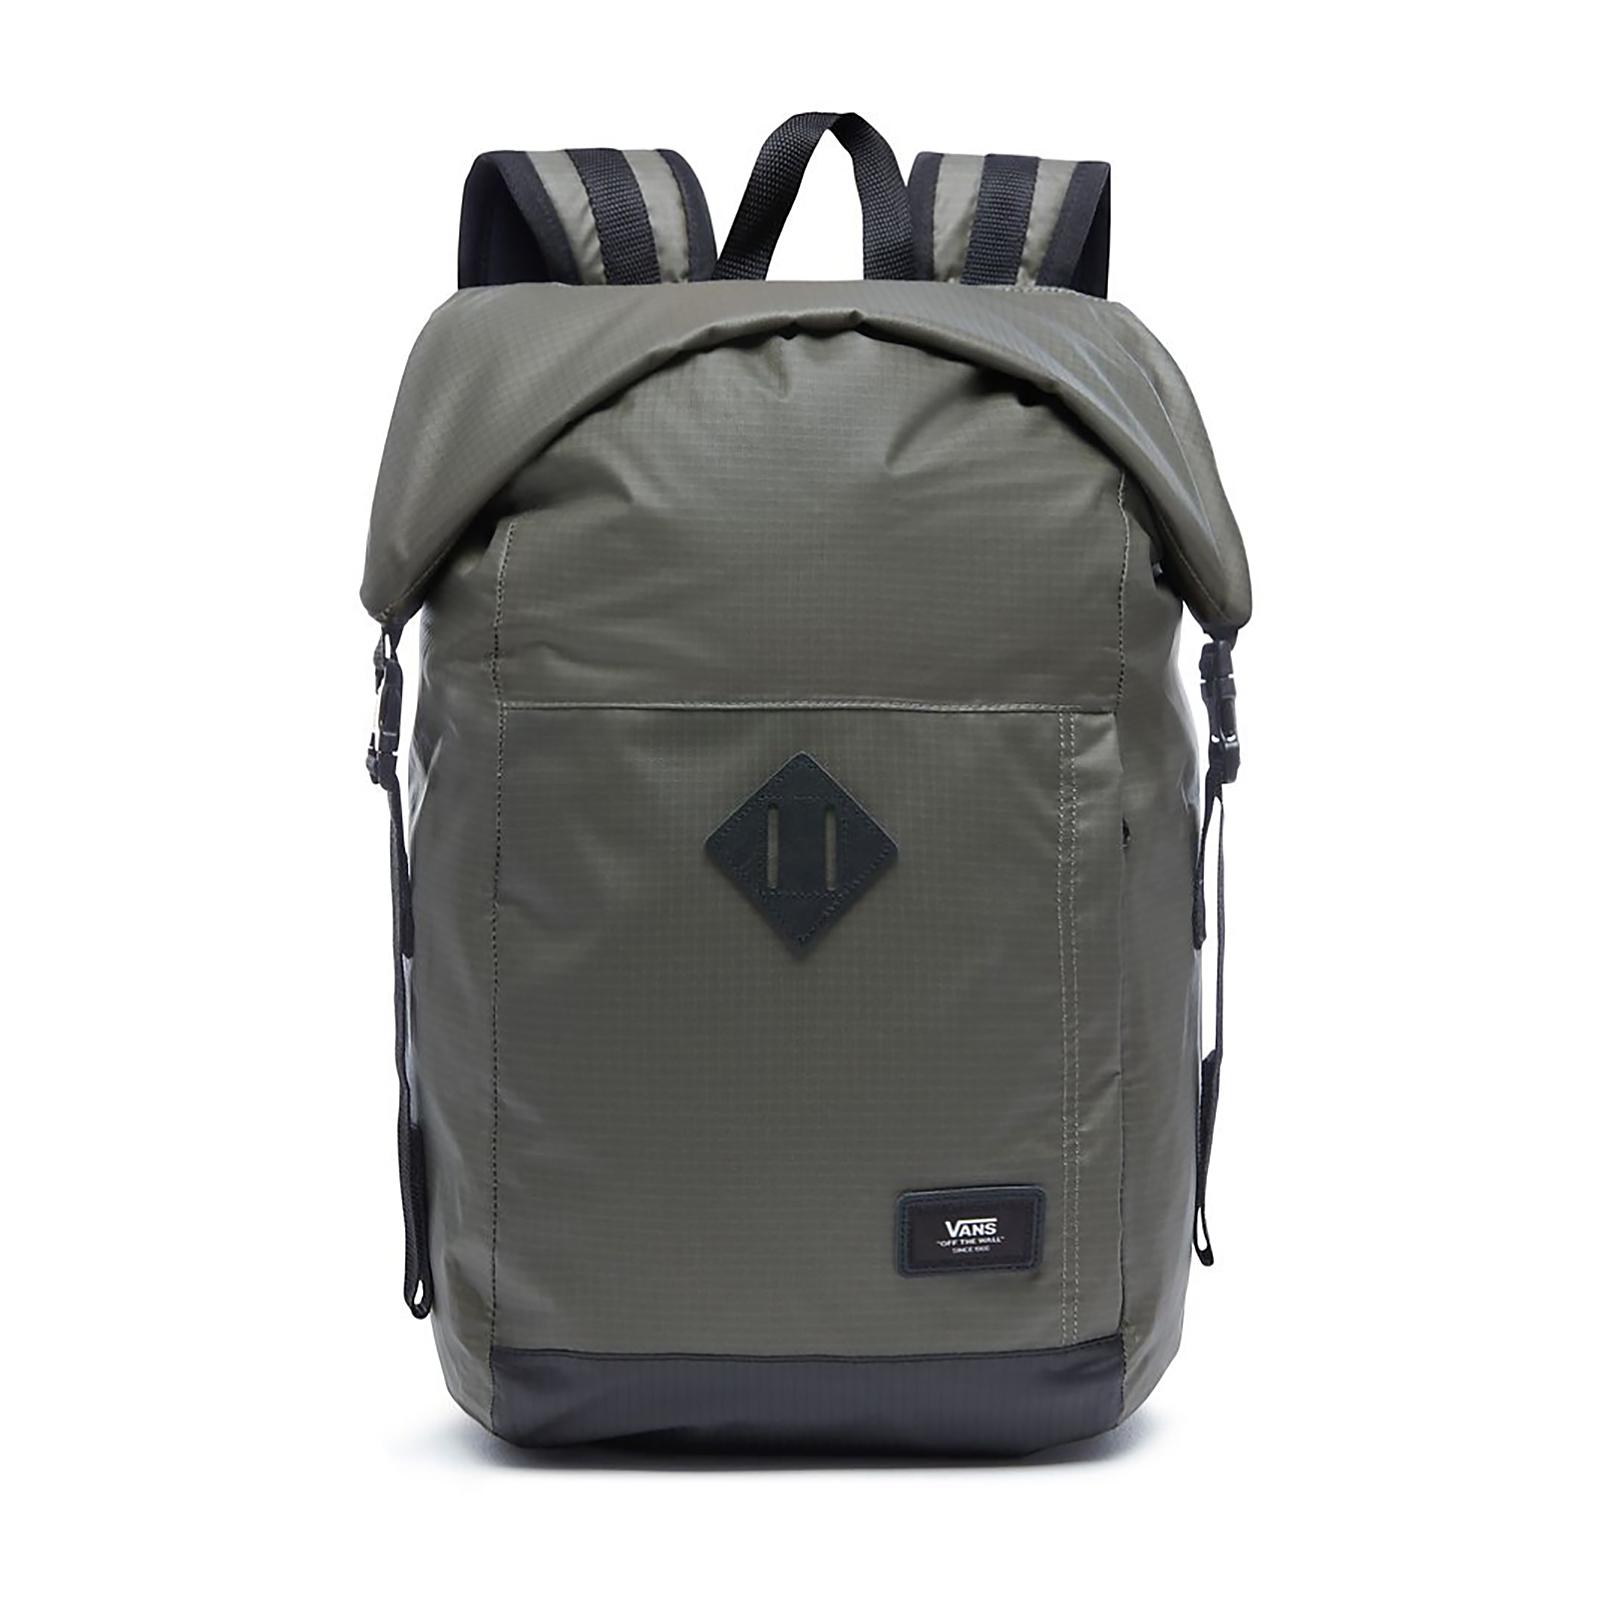 Vans-Zaini-Mn-Fend-Roll-Top-Backpack-Grape-Leaf-Verde